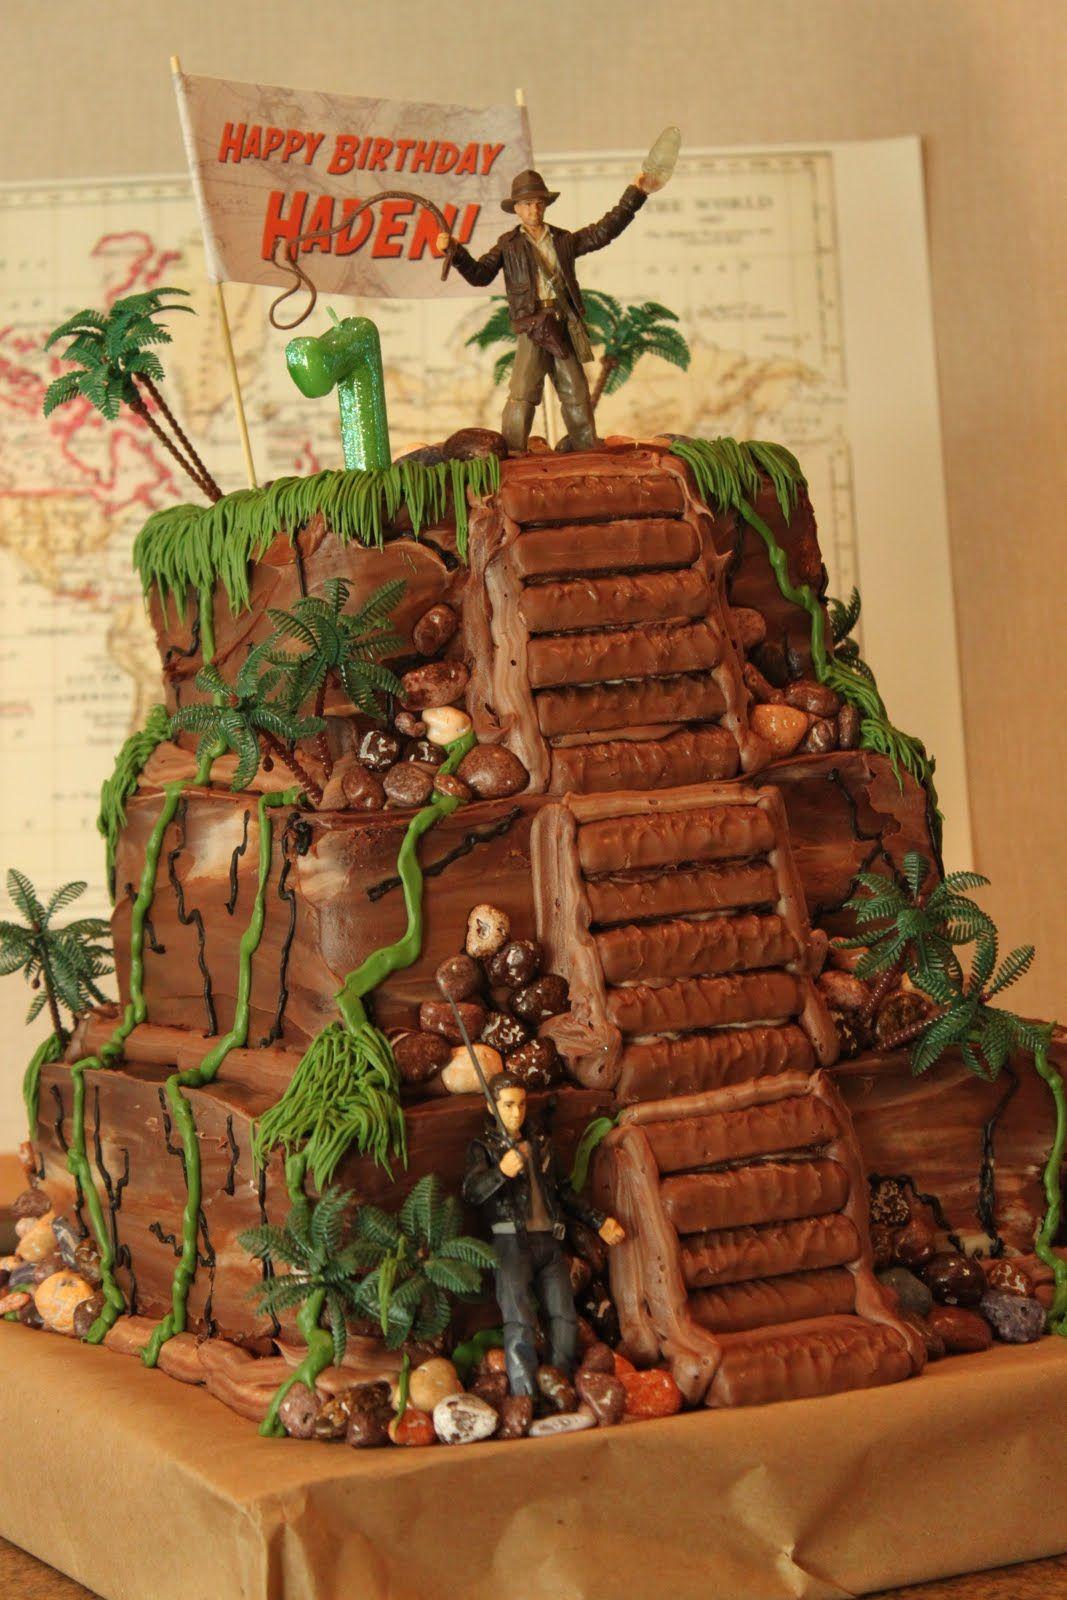 Wondrous Indiana Jones The Cake With Images Indiana Jones Cake Funny Birthday Cards Online Inifodamsfinfo